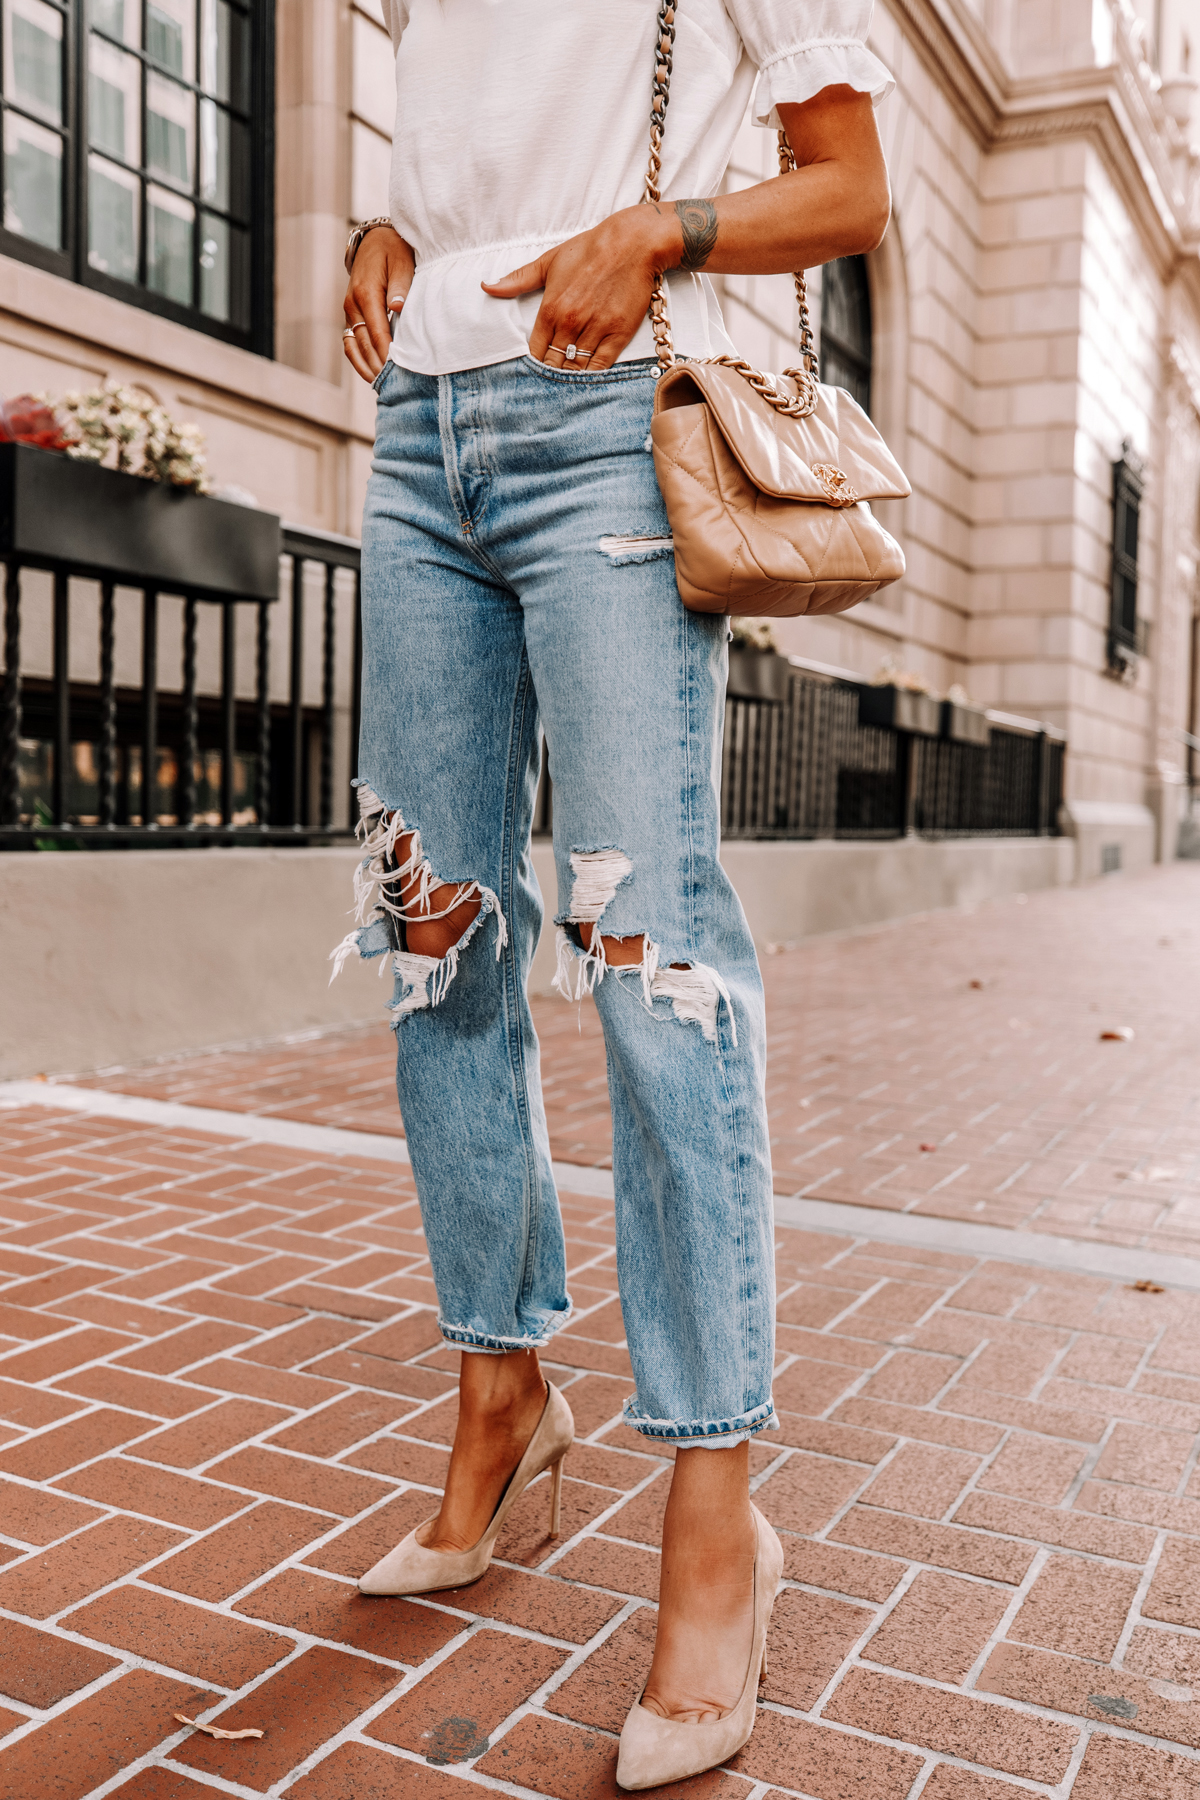 Fashion Jackson Wearing White Peplum Top AGOLDE Ripped 90s Jeans Nude Pumps Chanel 19 Beige Handbag